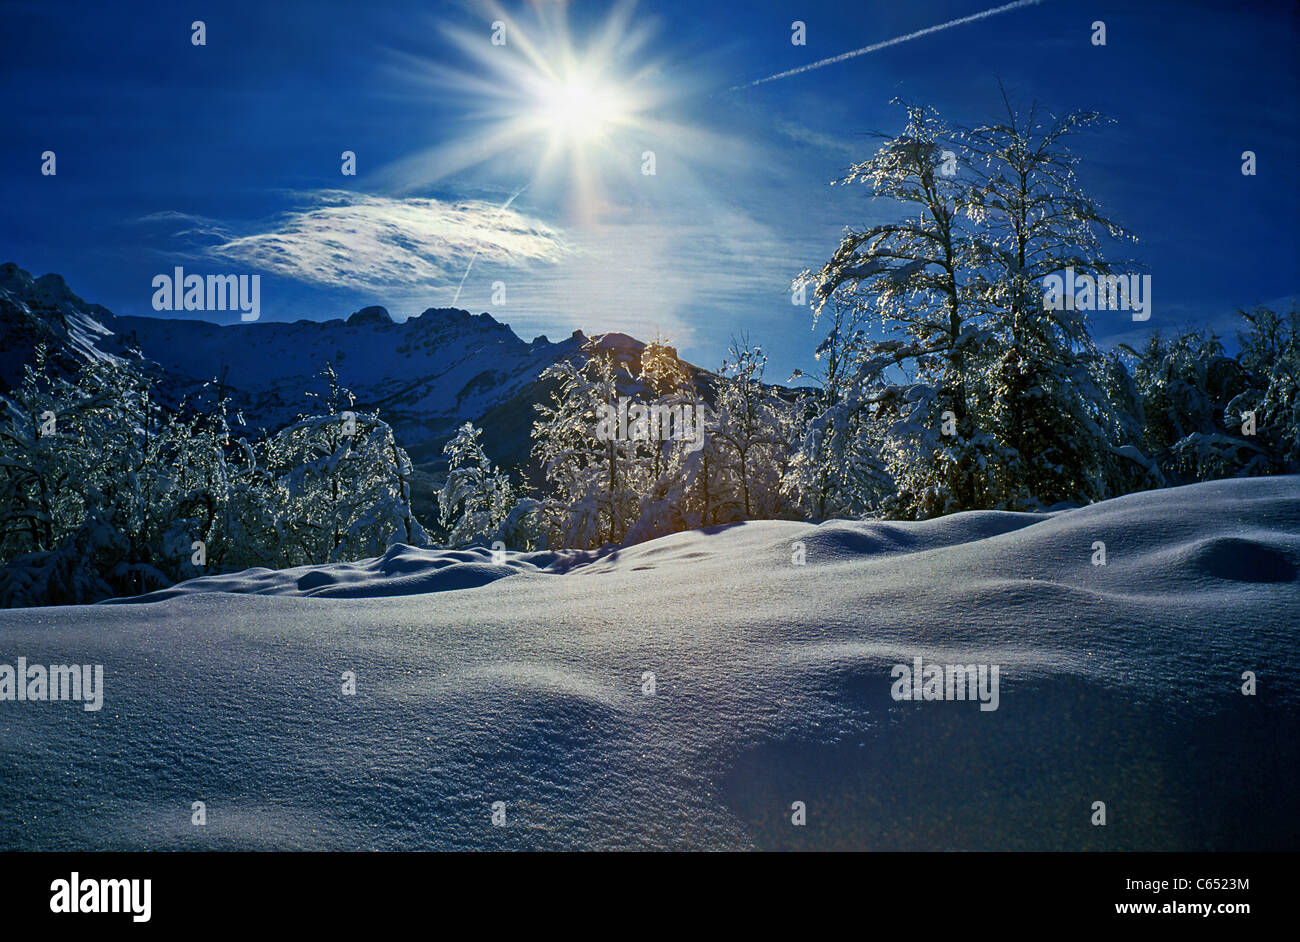 Winter under the snow. - Stock Image